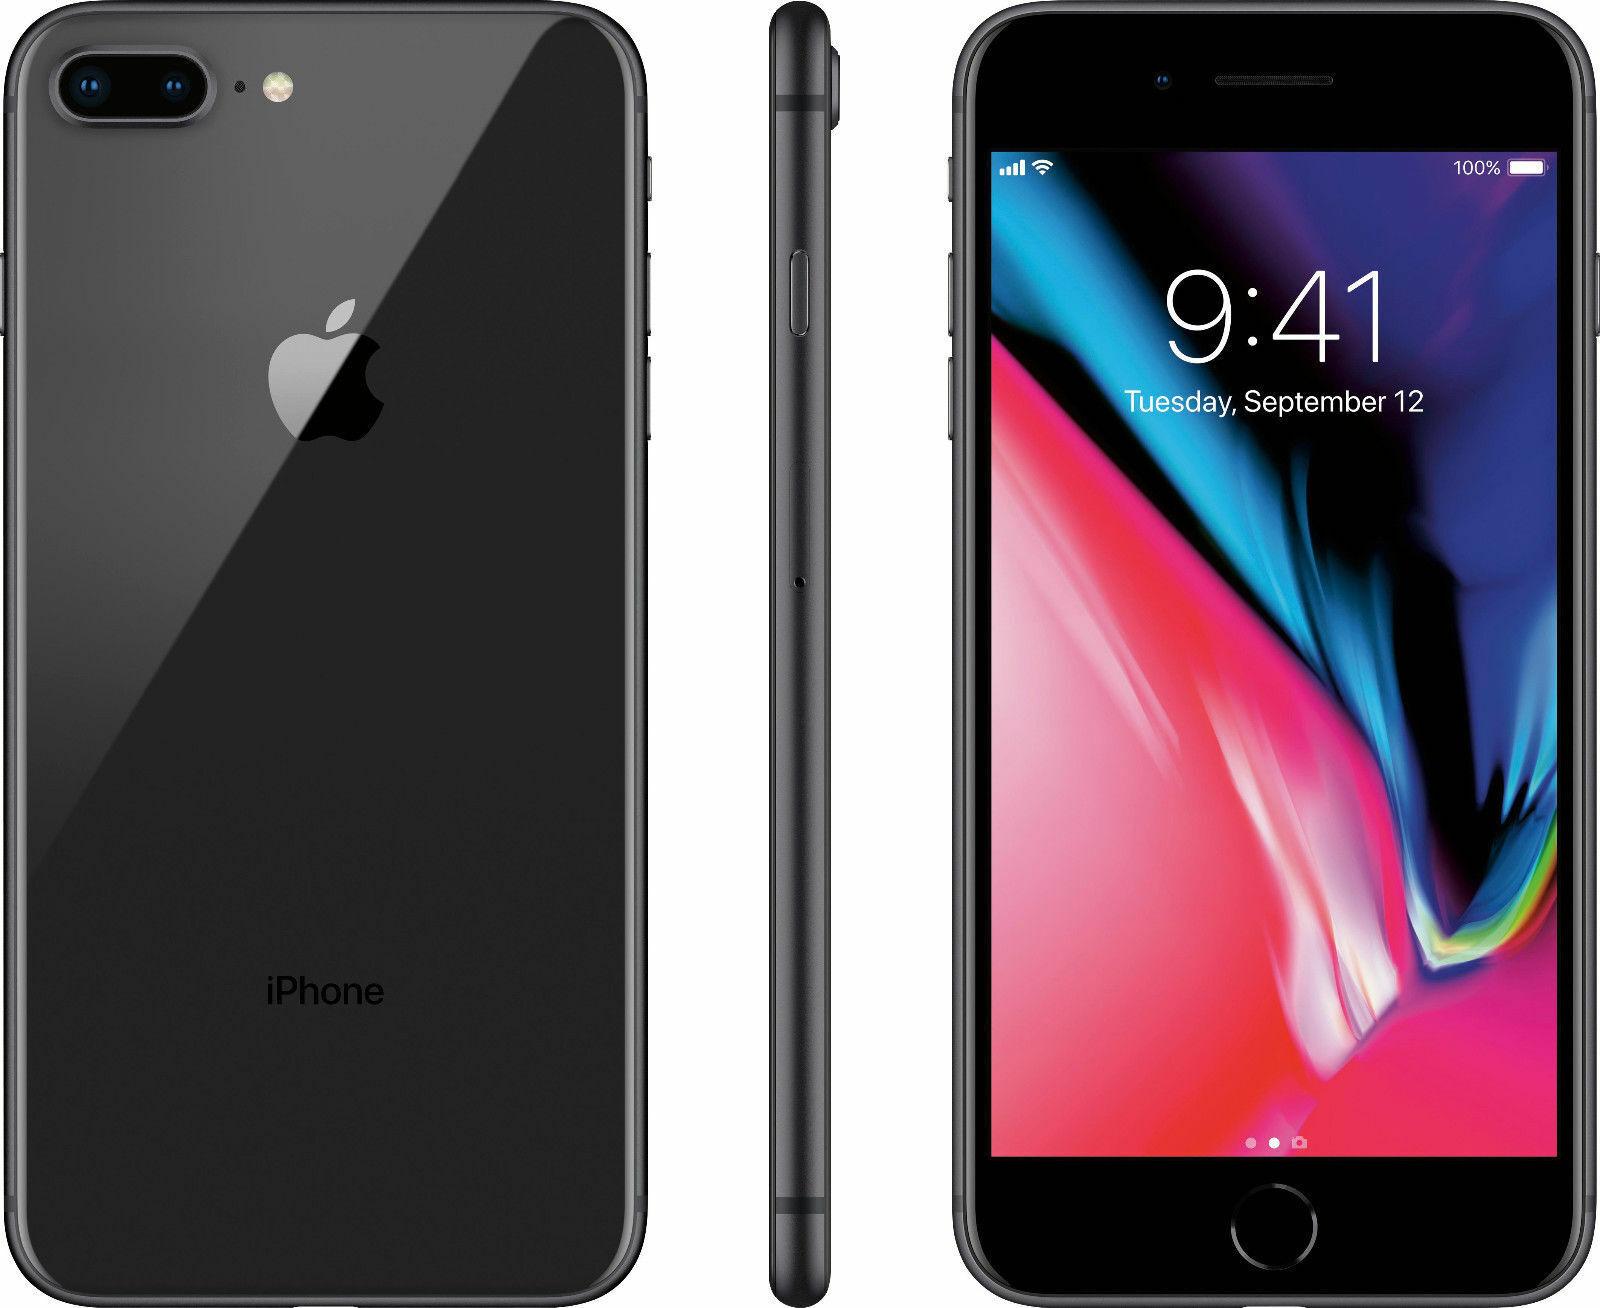 New Apple iPhone 8 Plus 64GB (GSM Unlocked) AT&T T-Mobile Metro PCS 4G LTE